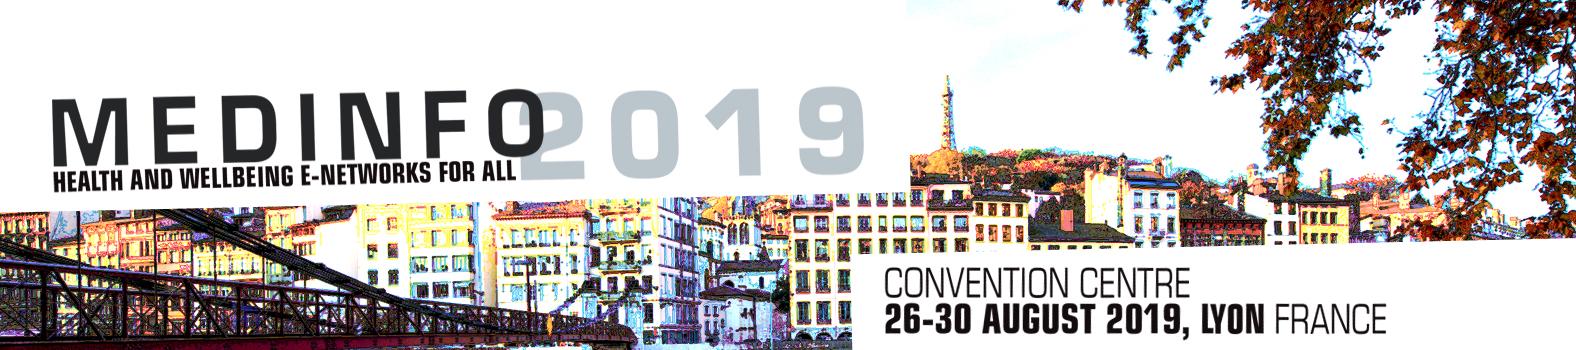 MEDINFO Lyon 2019